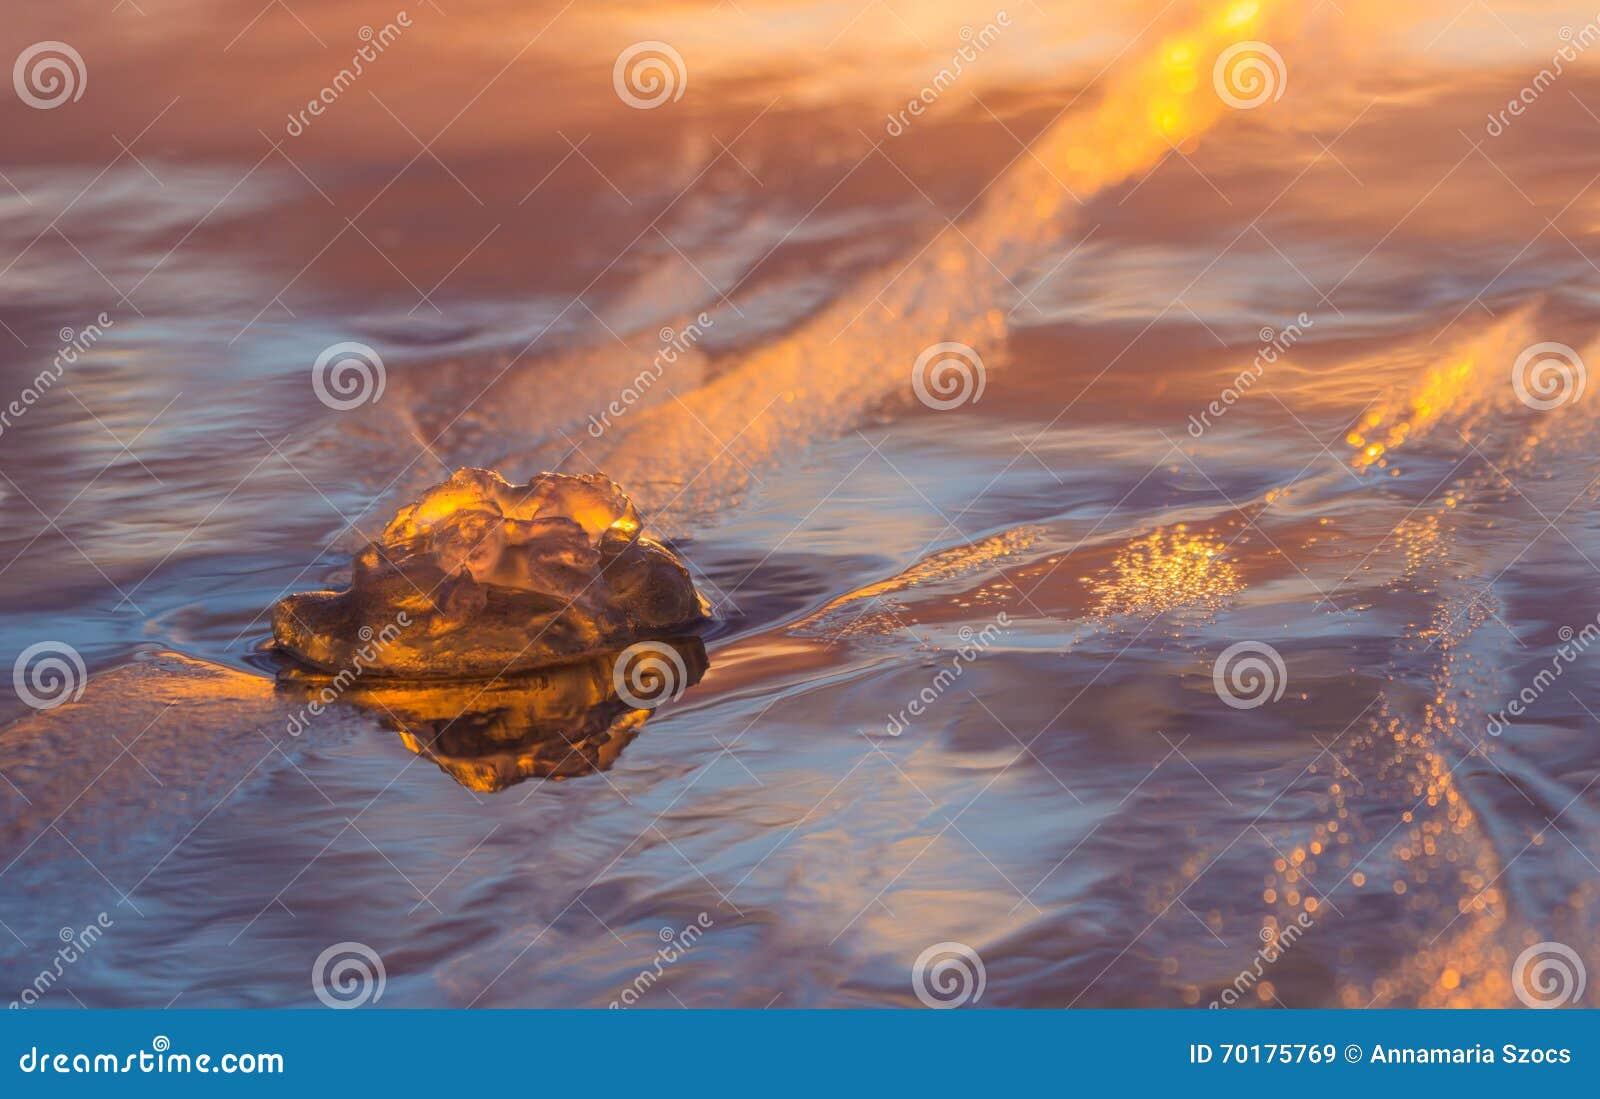 Medusa i solnedgång